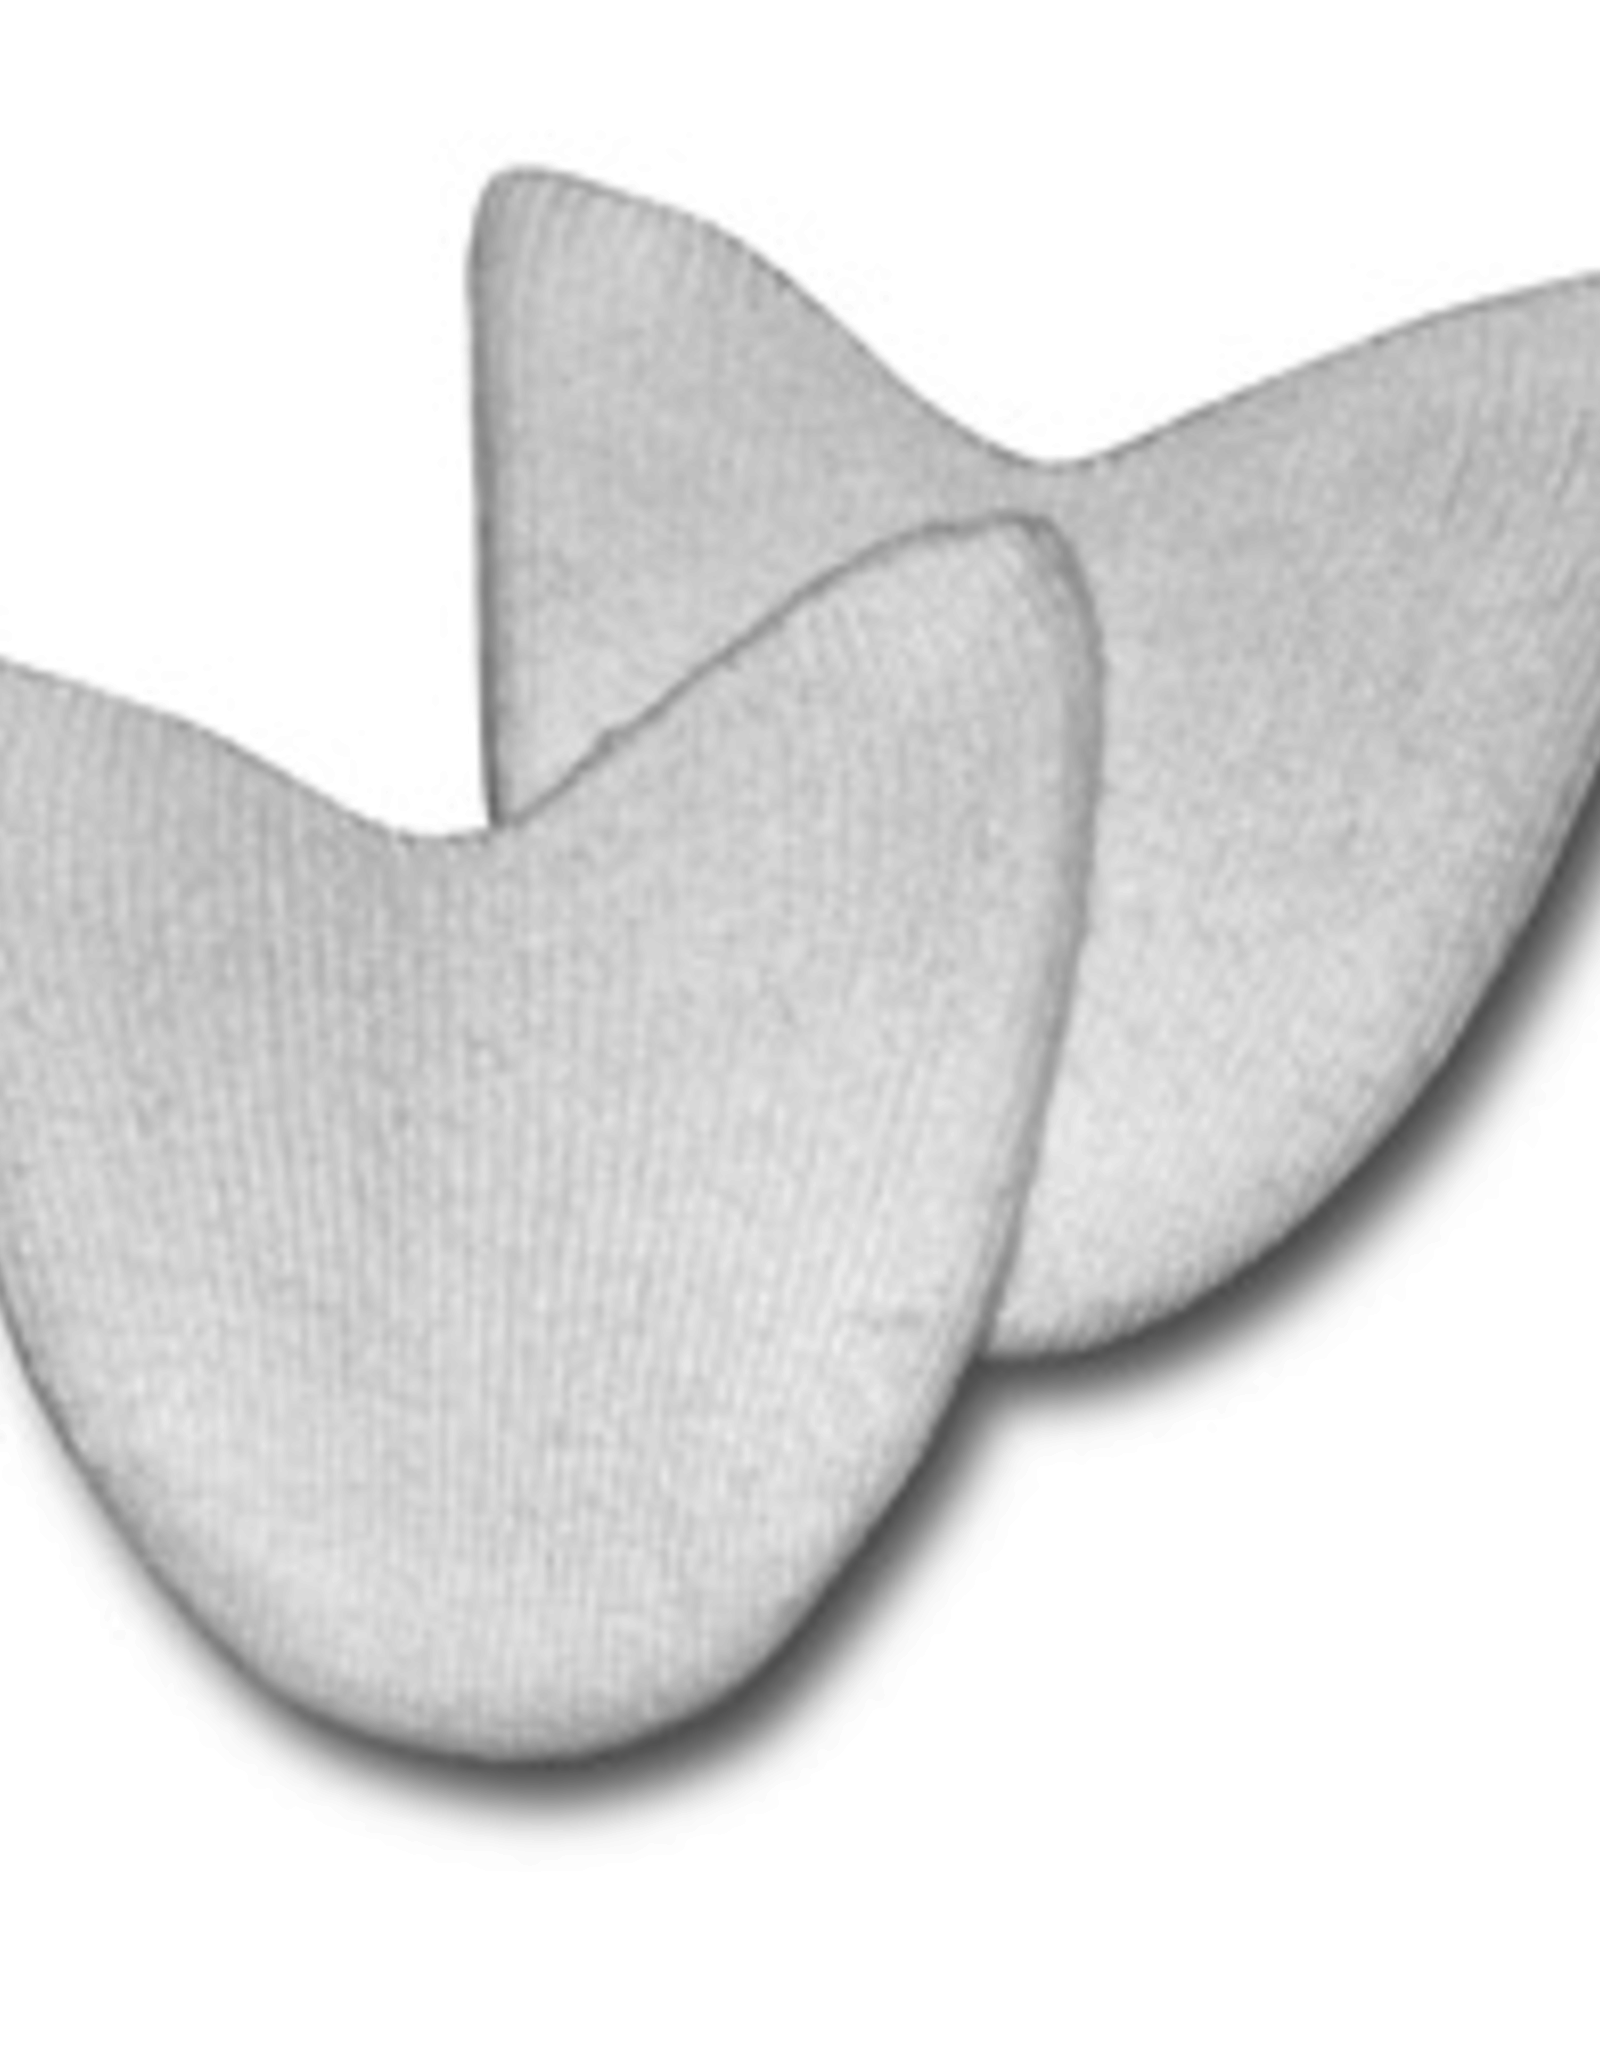 Pillows For Pointe Super Gellows Seamless Sock